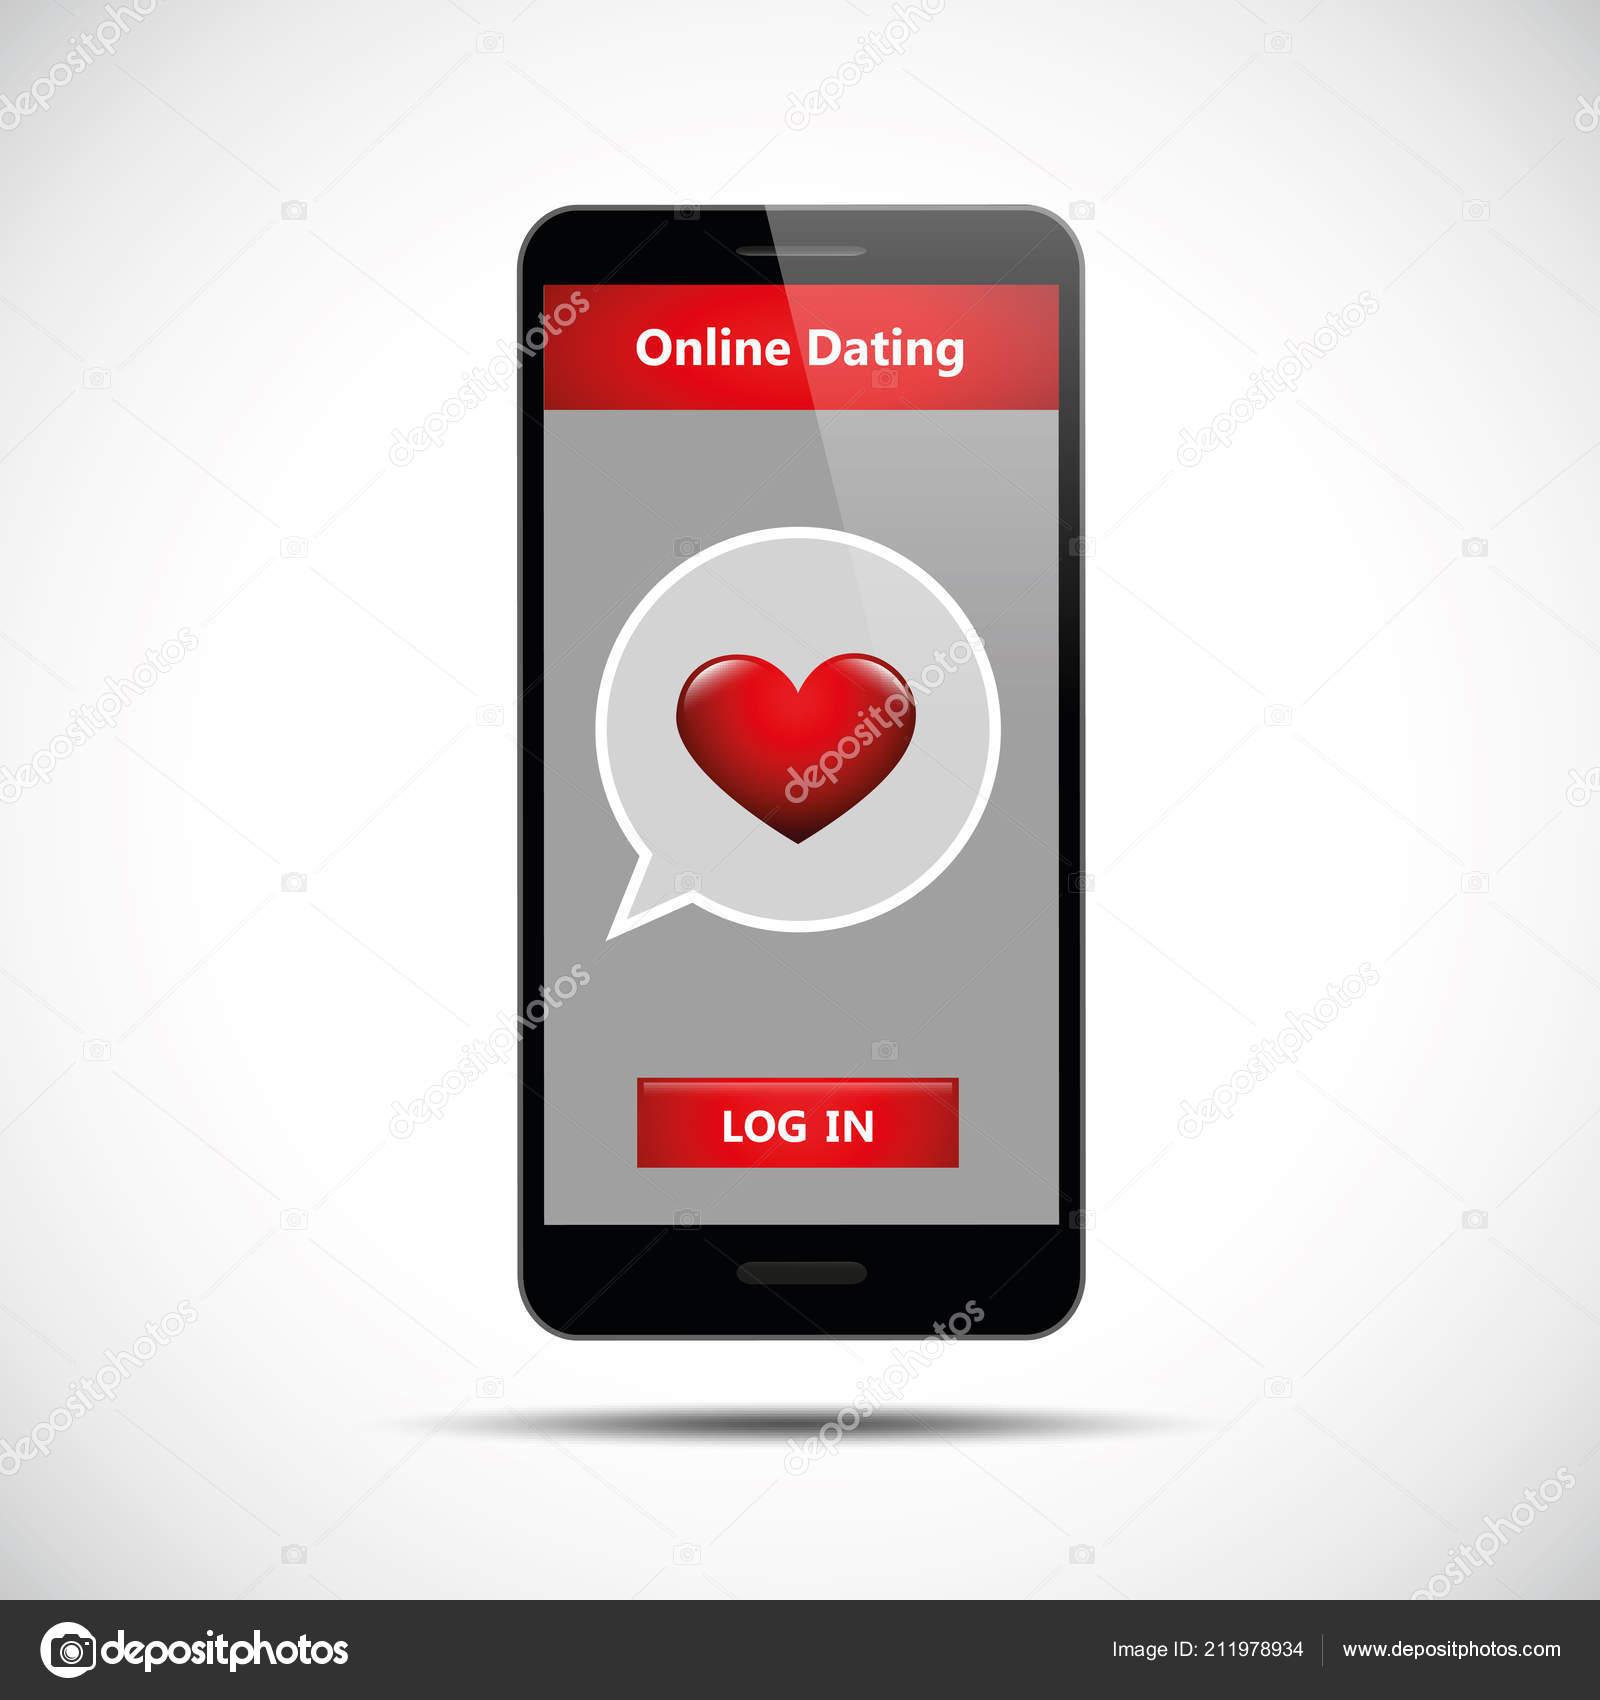 Online-Dating-App kostenlos herunterladen Beste Dating-Apps-Liste